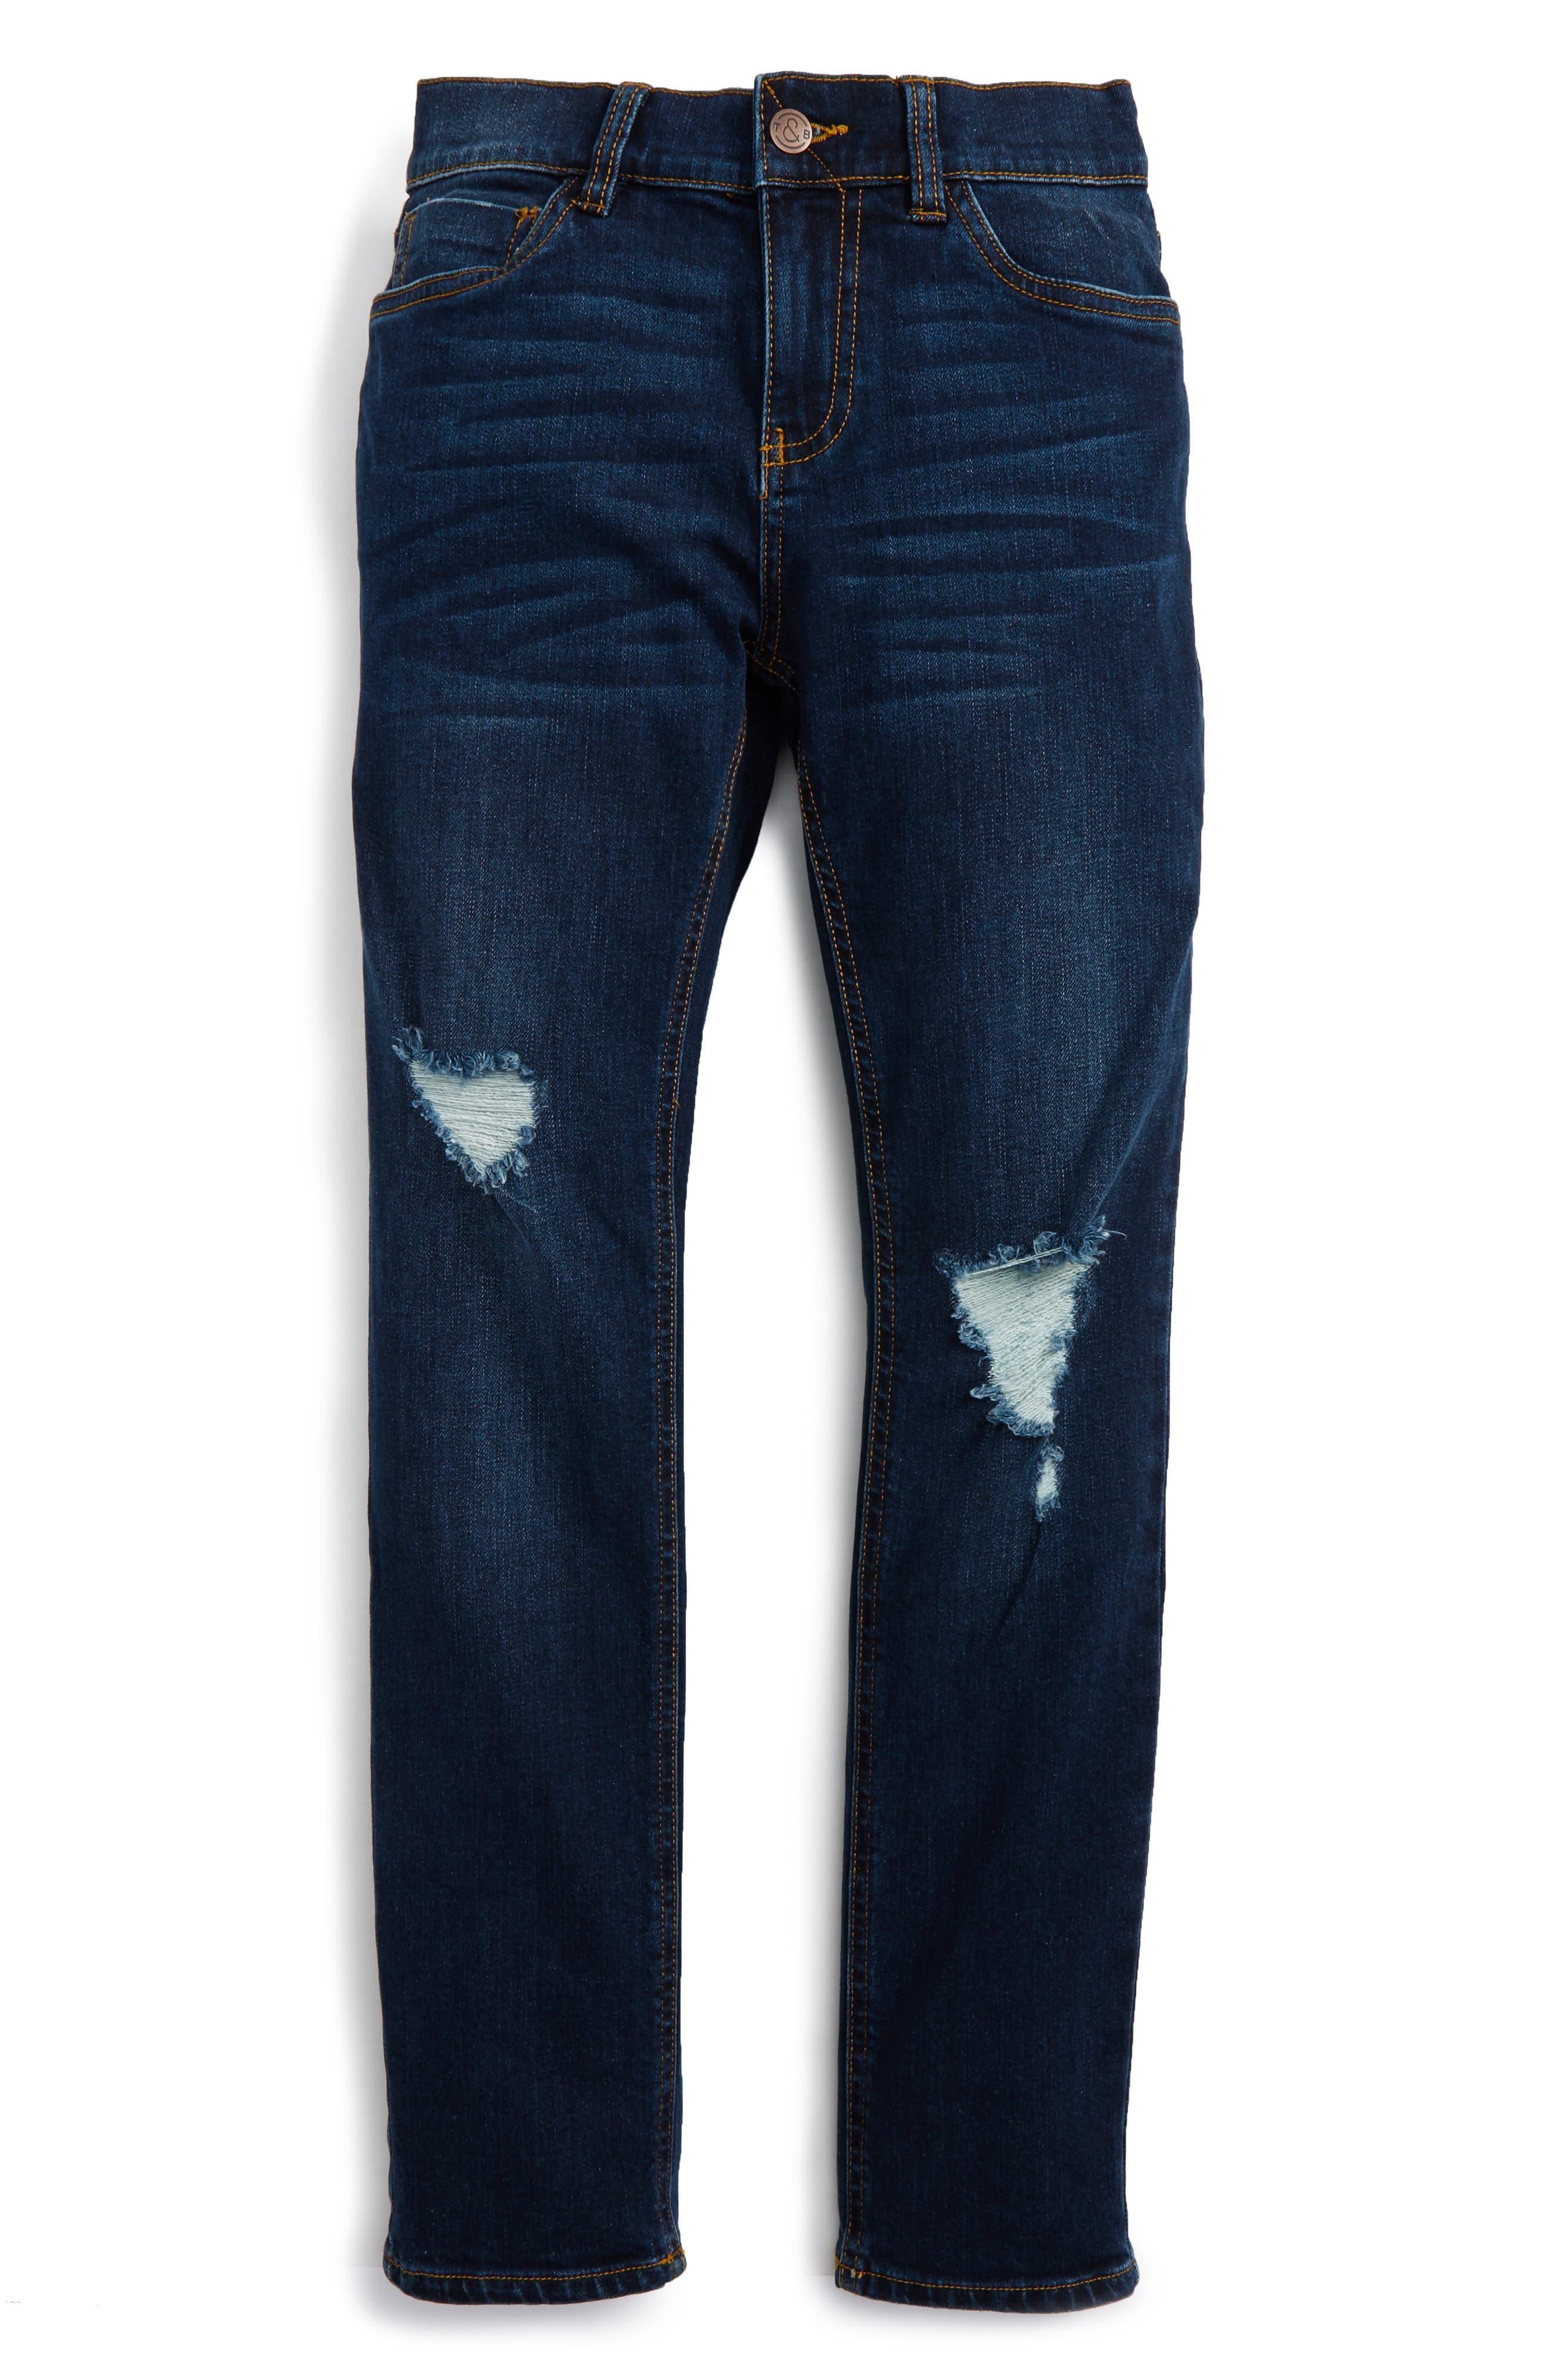 Main Image - Treasure & Bond Distressed Skinny Jeans (Big Boys)